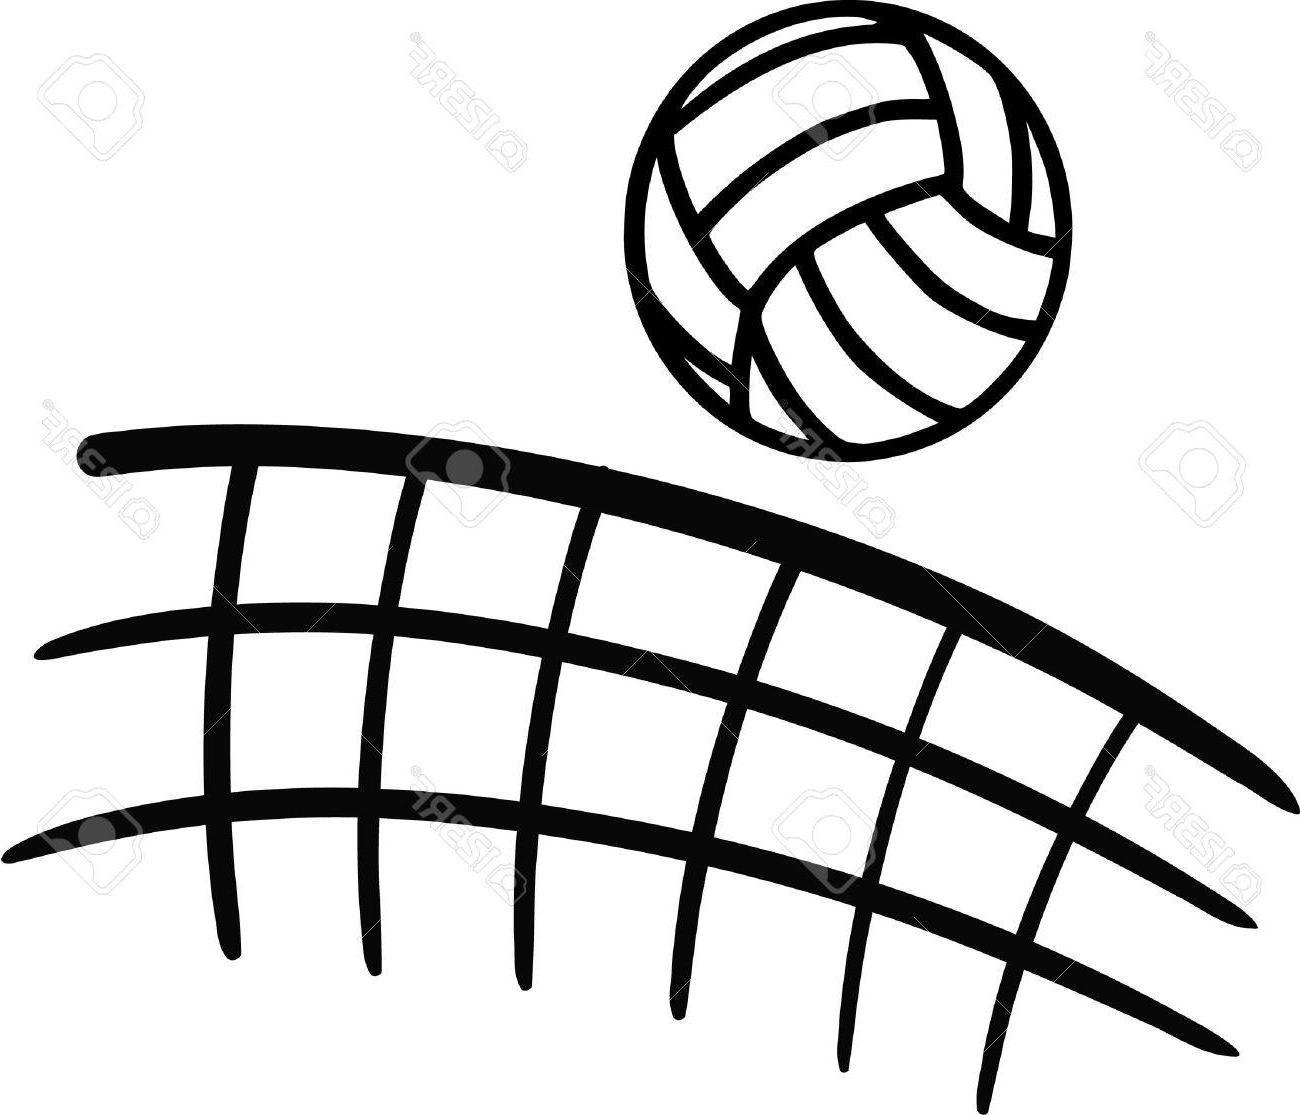 Clipart Volleyball Volleyball Net Clipart Volleyball